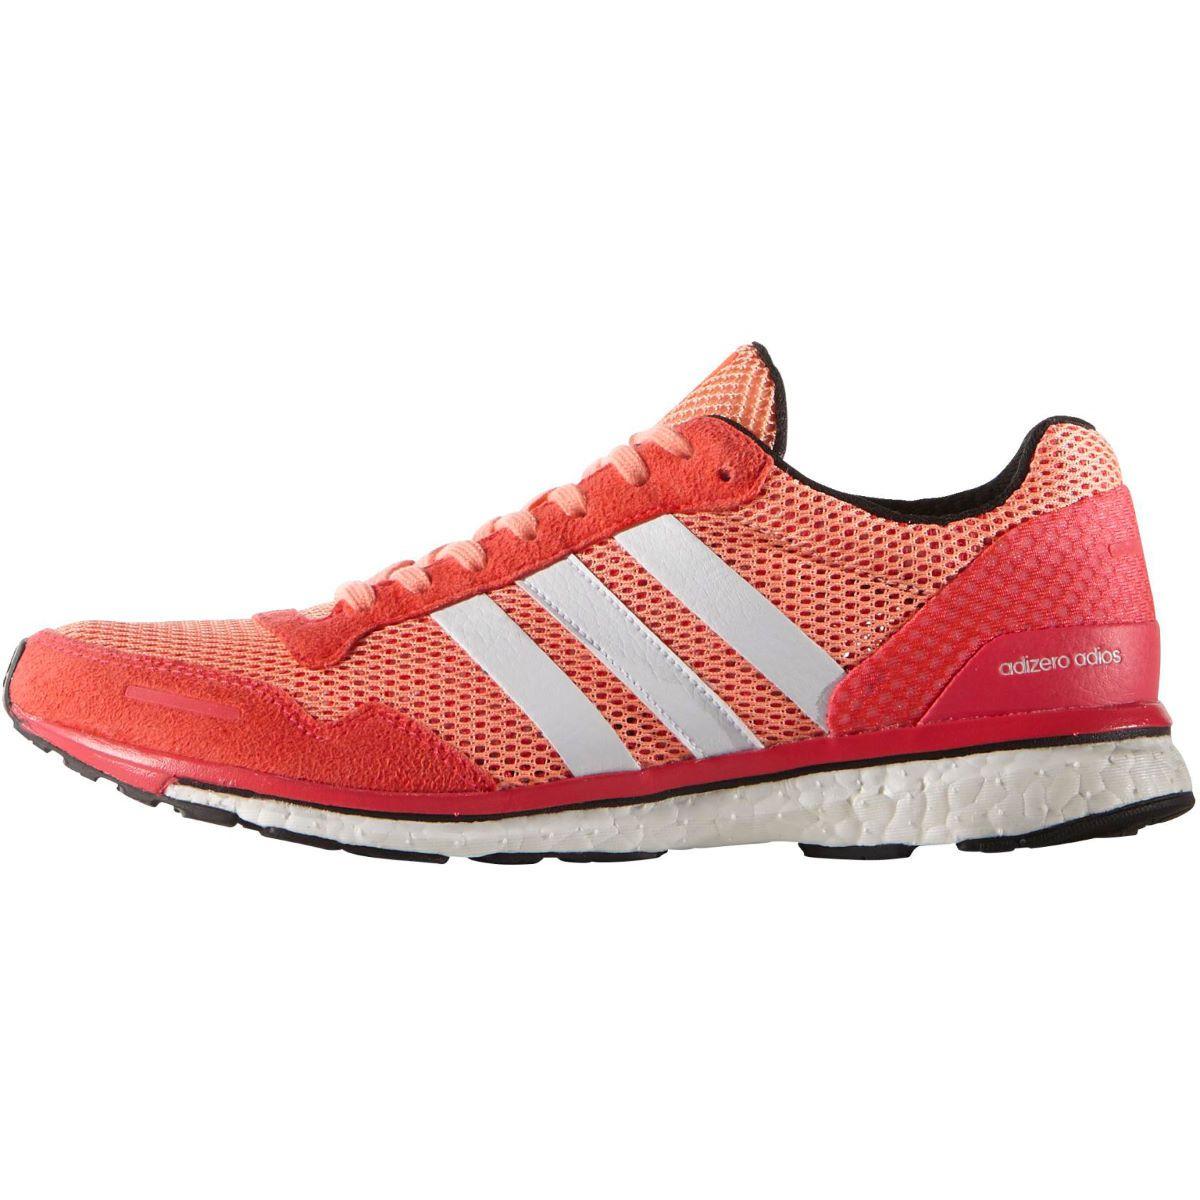 Adidas Women's Adizero Adios 3 Shoes (SS16) Racing Running Shoes